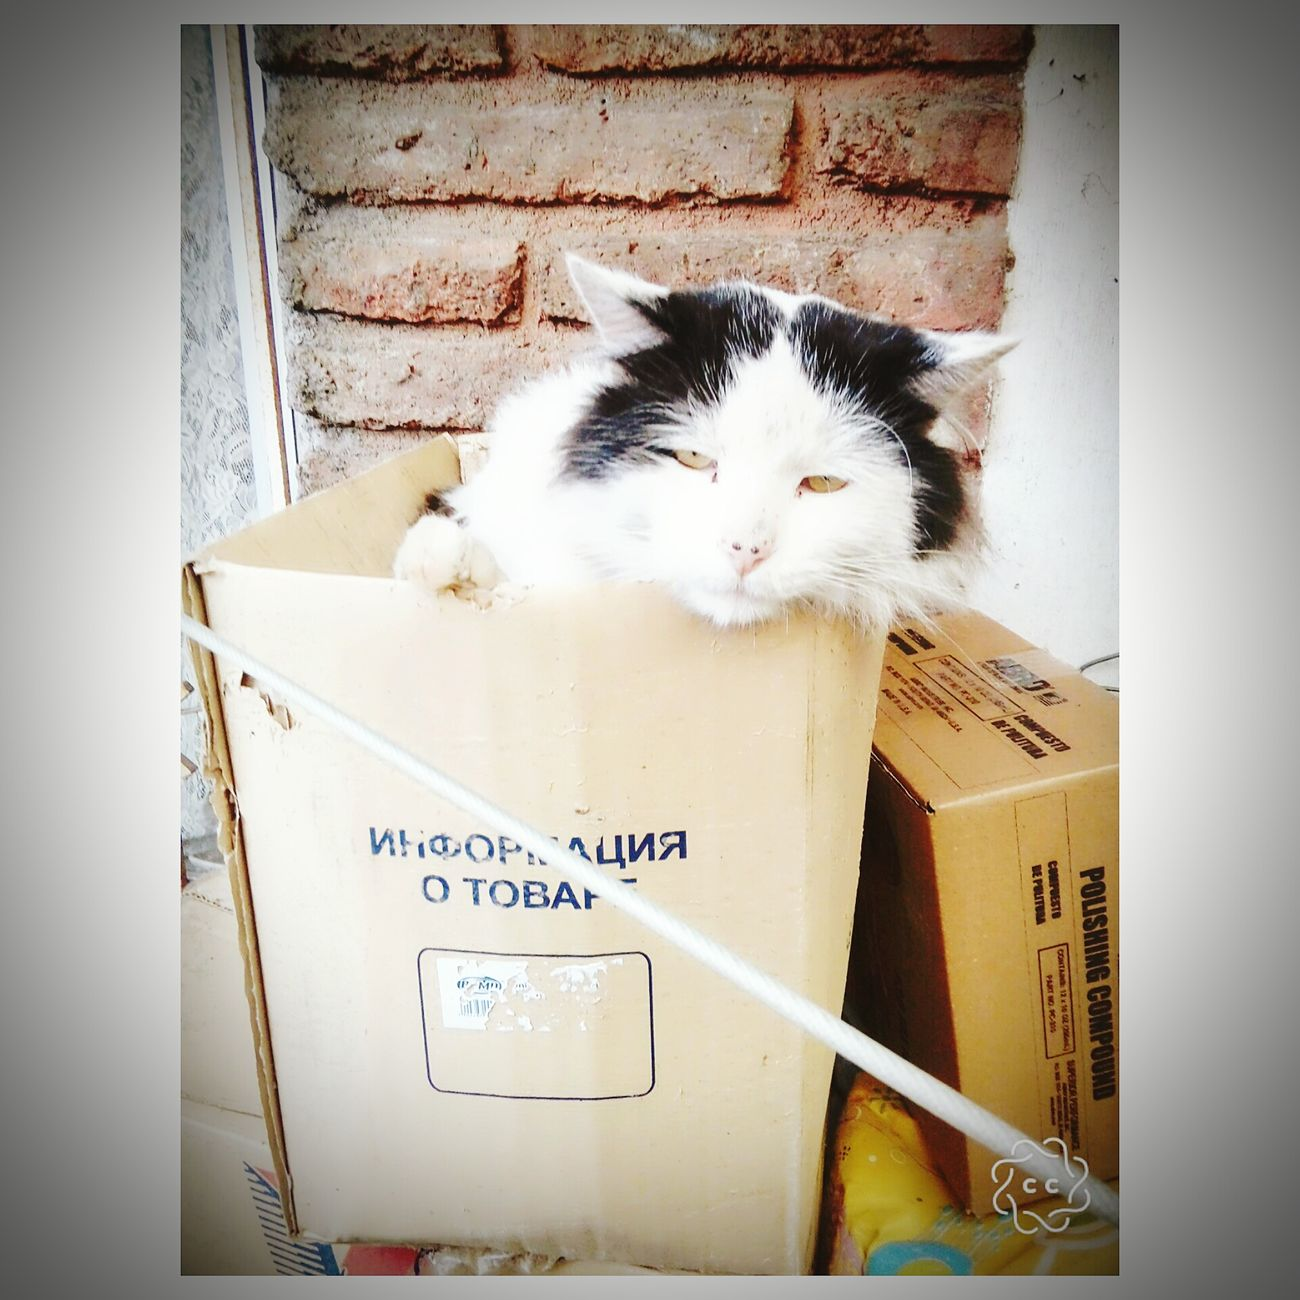 Cats Mascotas 🐶 Evans Santiago De Chile First Eyeem Photo